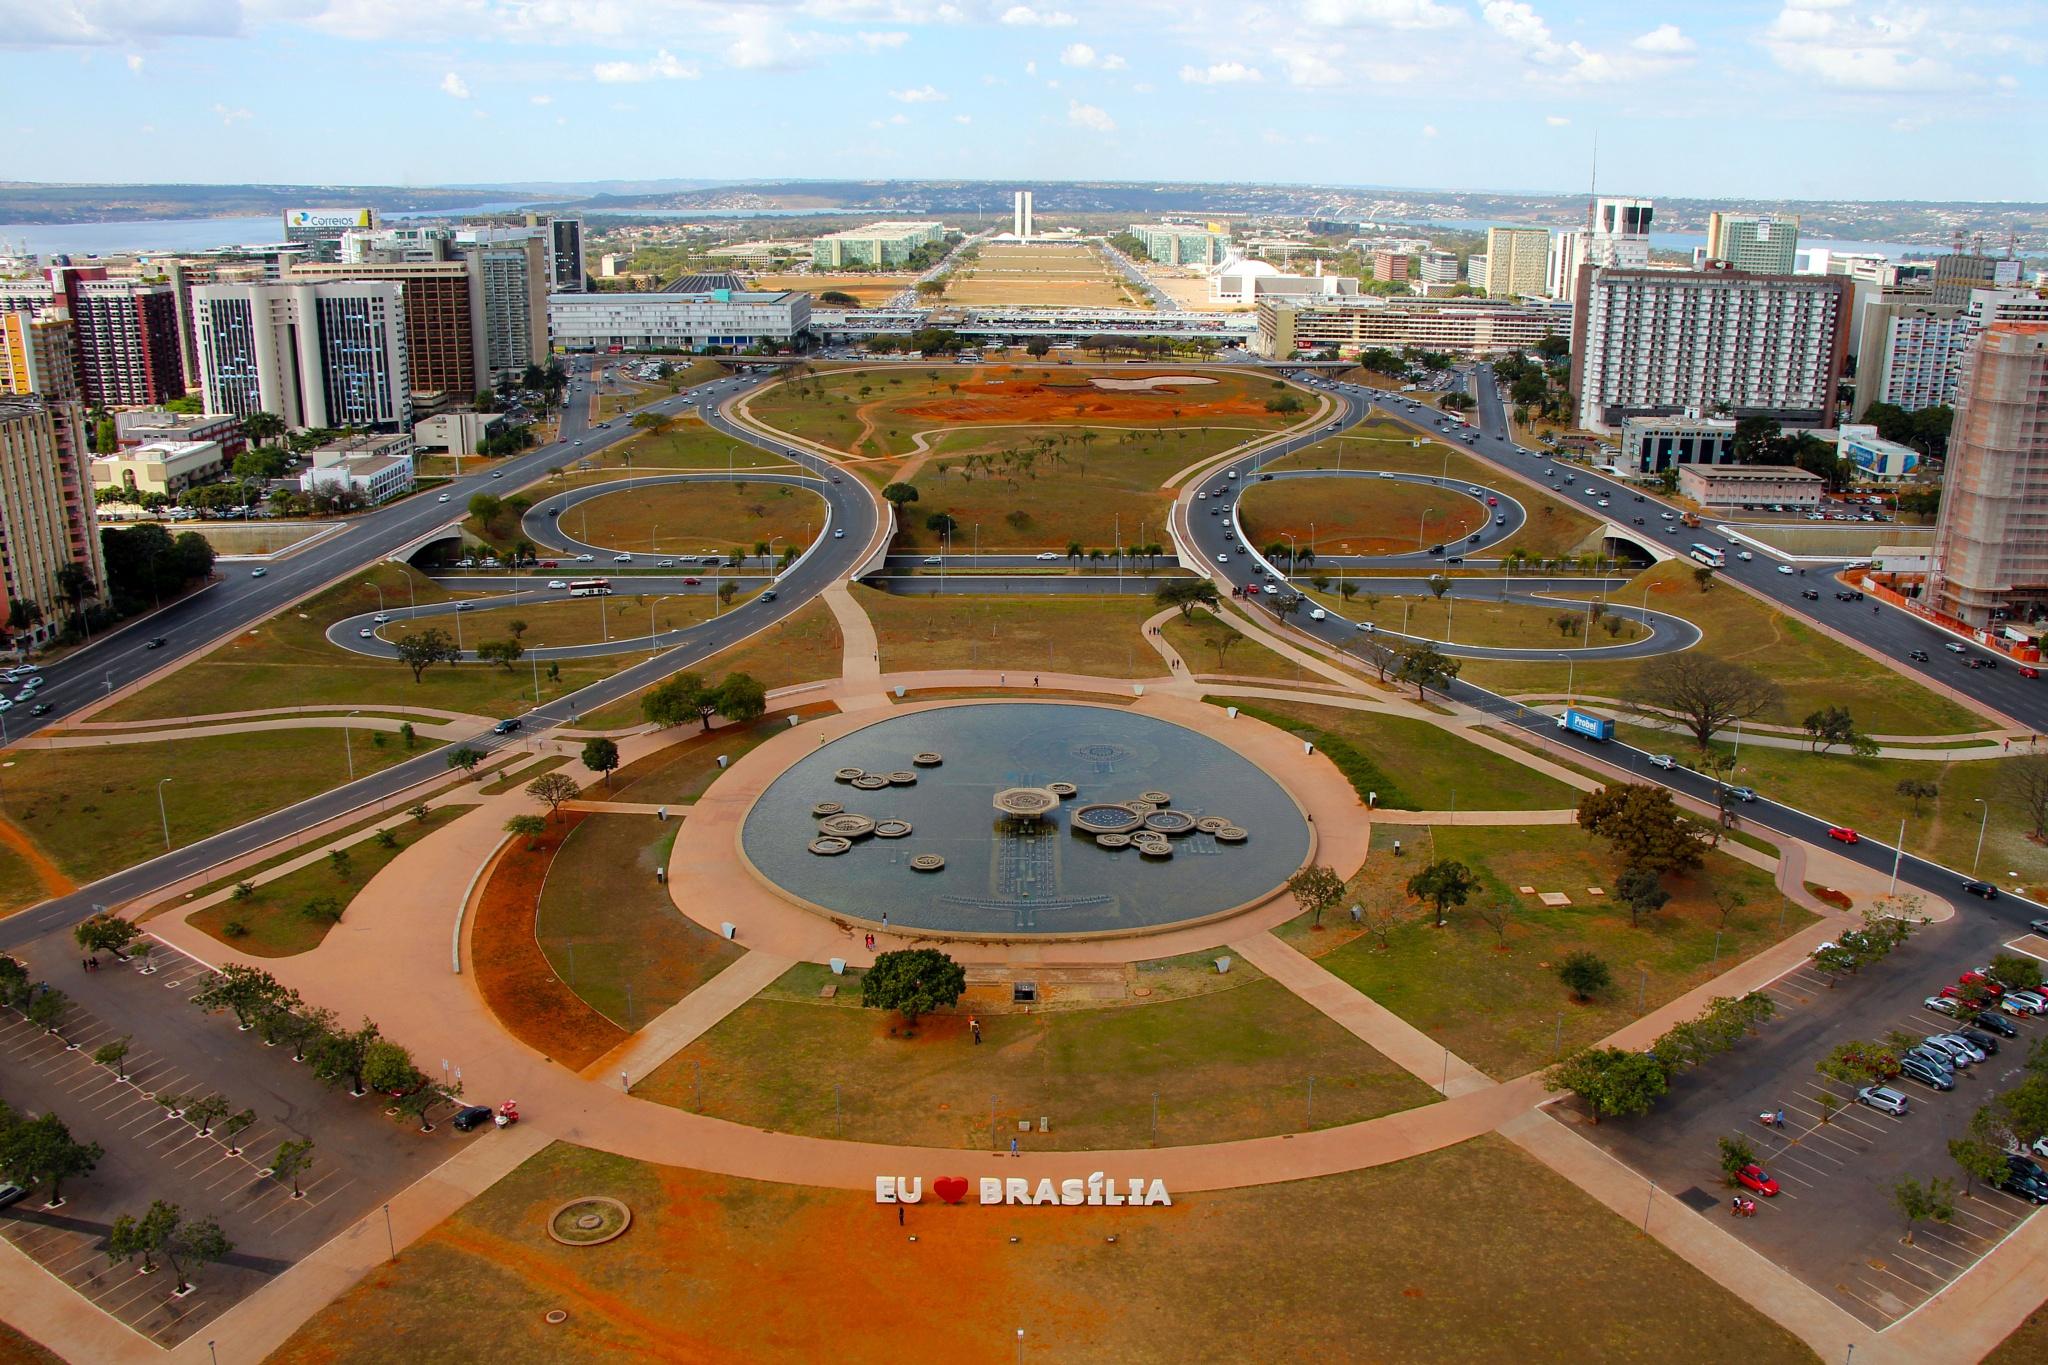 Eu Amo Brasília by BrandHaus